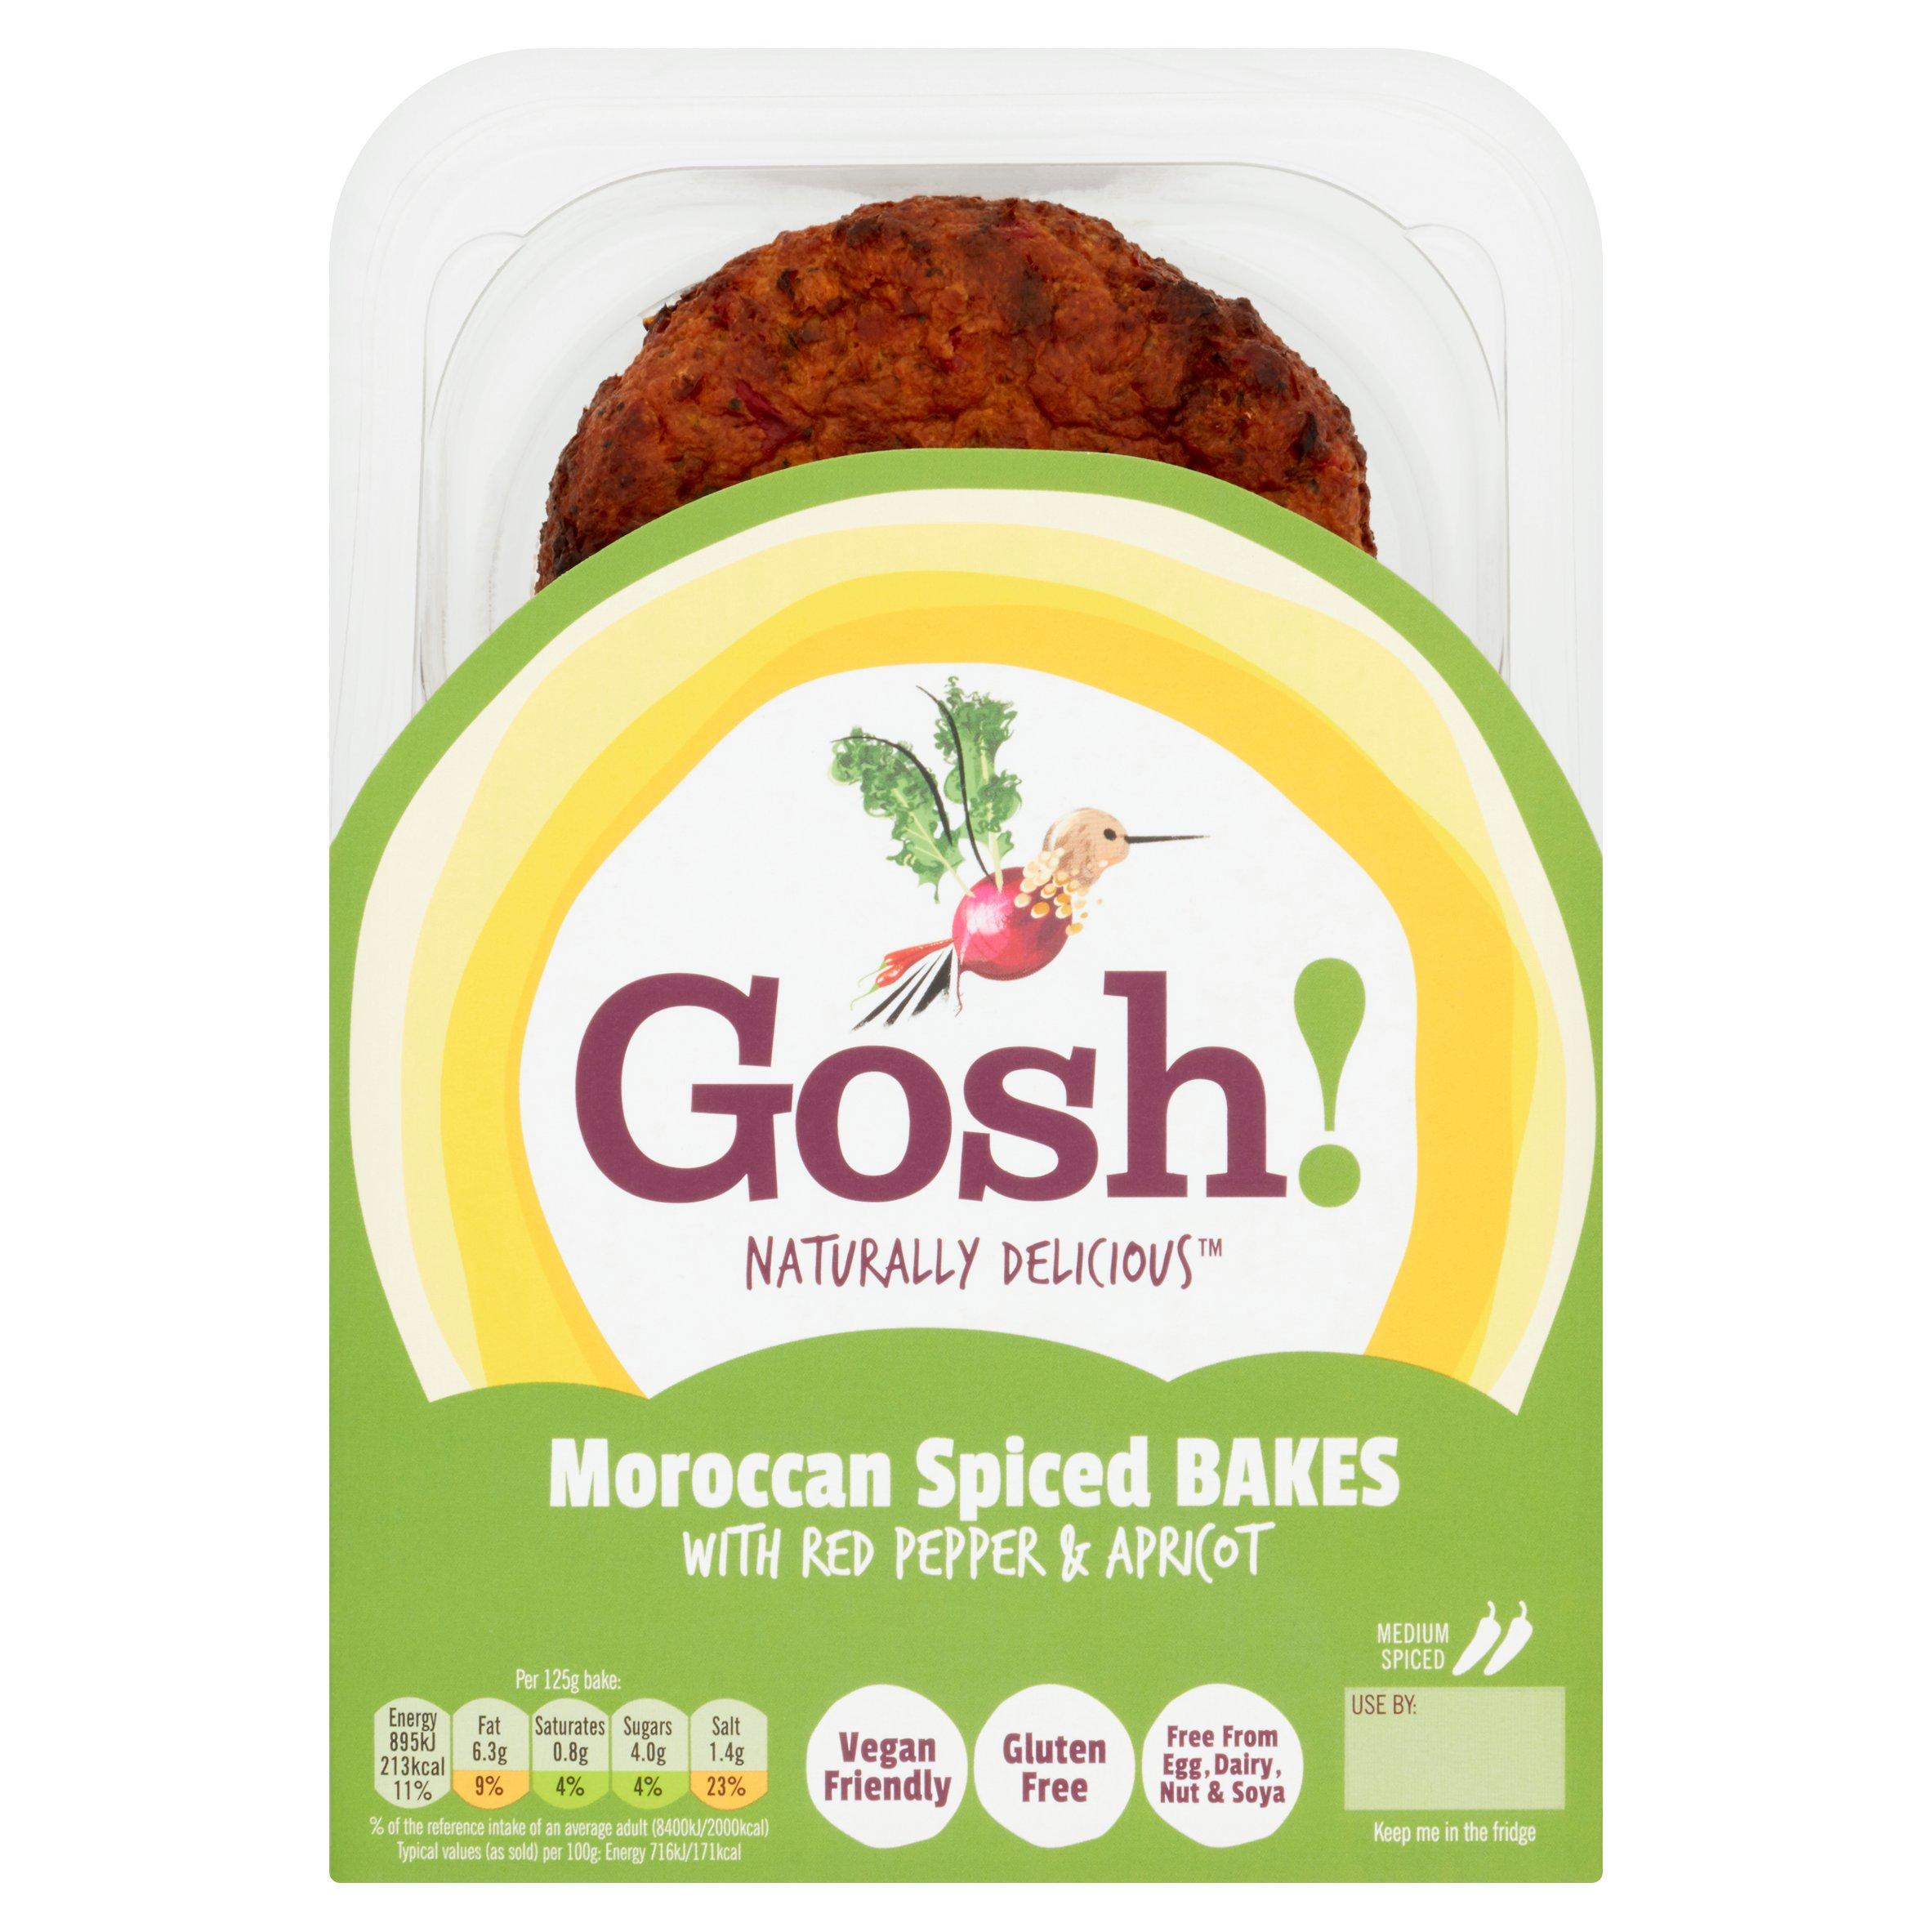 Gosh! Moroccan Spiced Bakes 250G